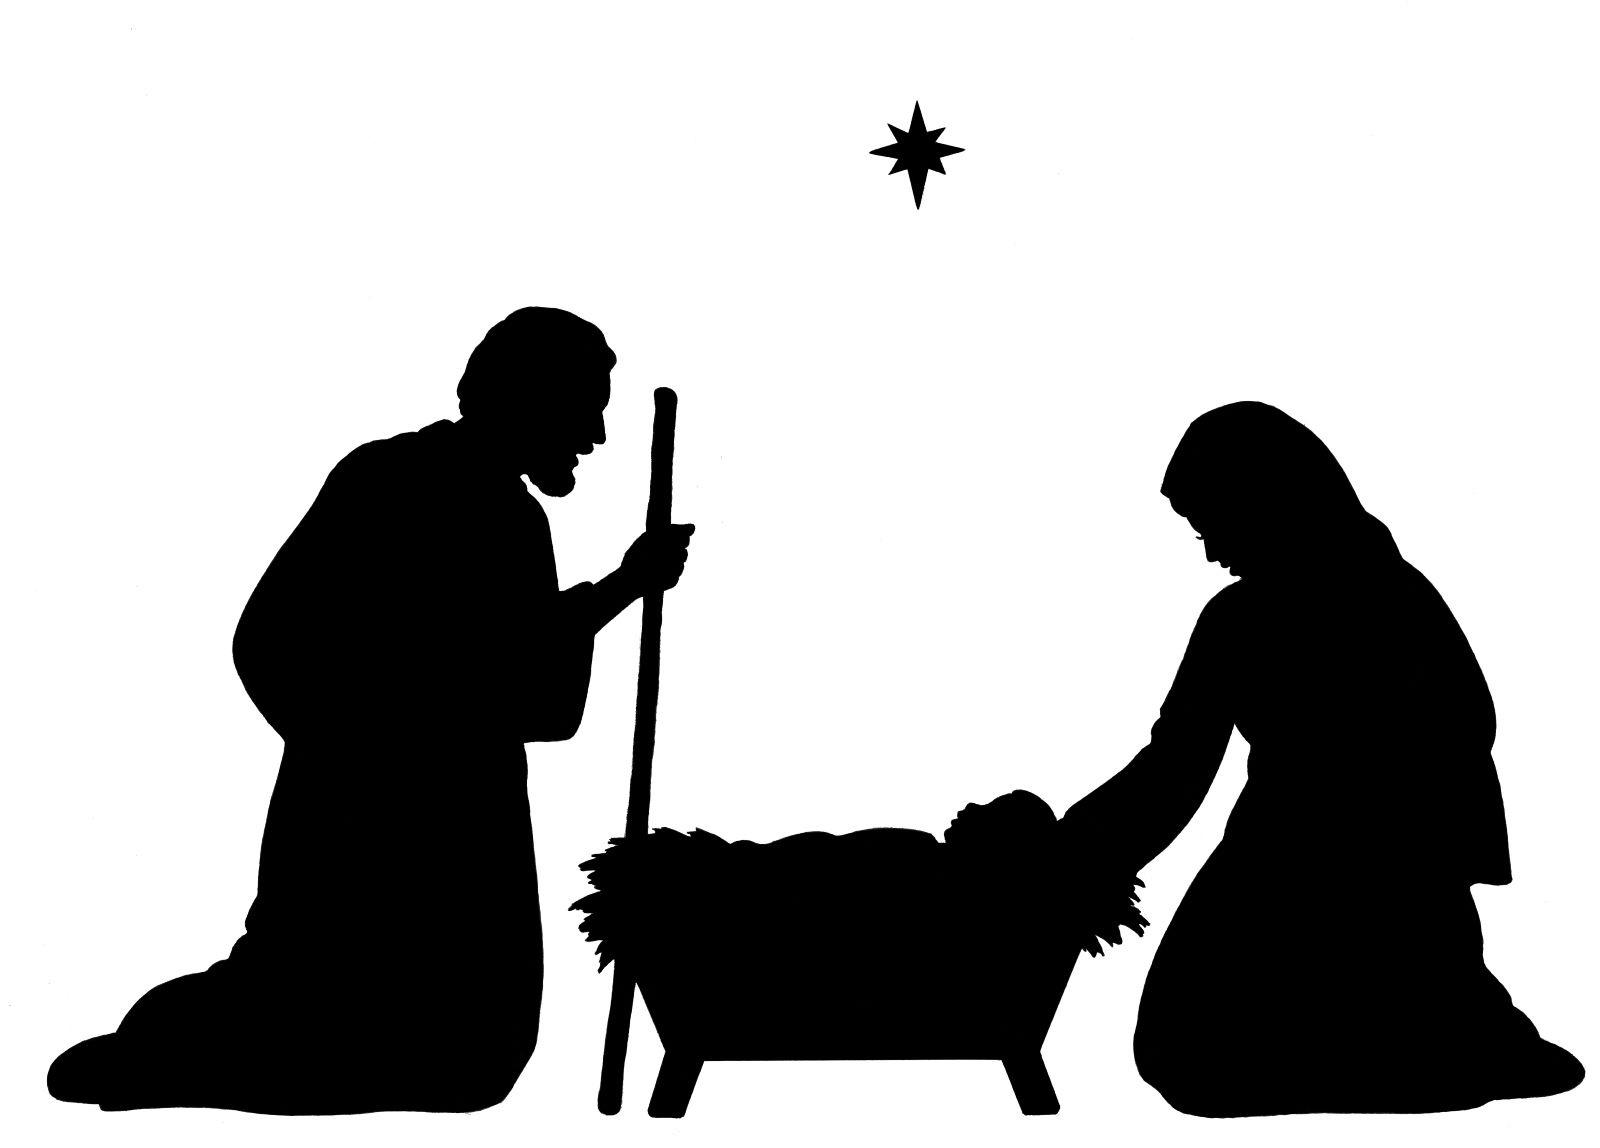 Baby Jesus Silhouette   Nativity Silhouette Clip Art   + Black - Free Printable Nativity Silhouette